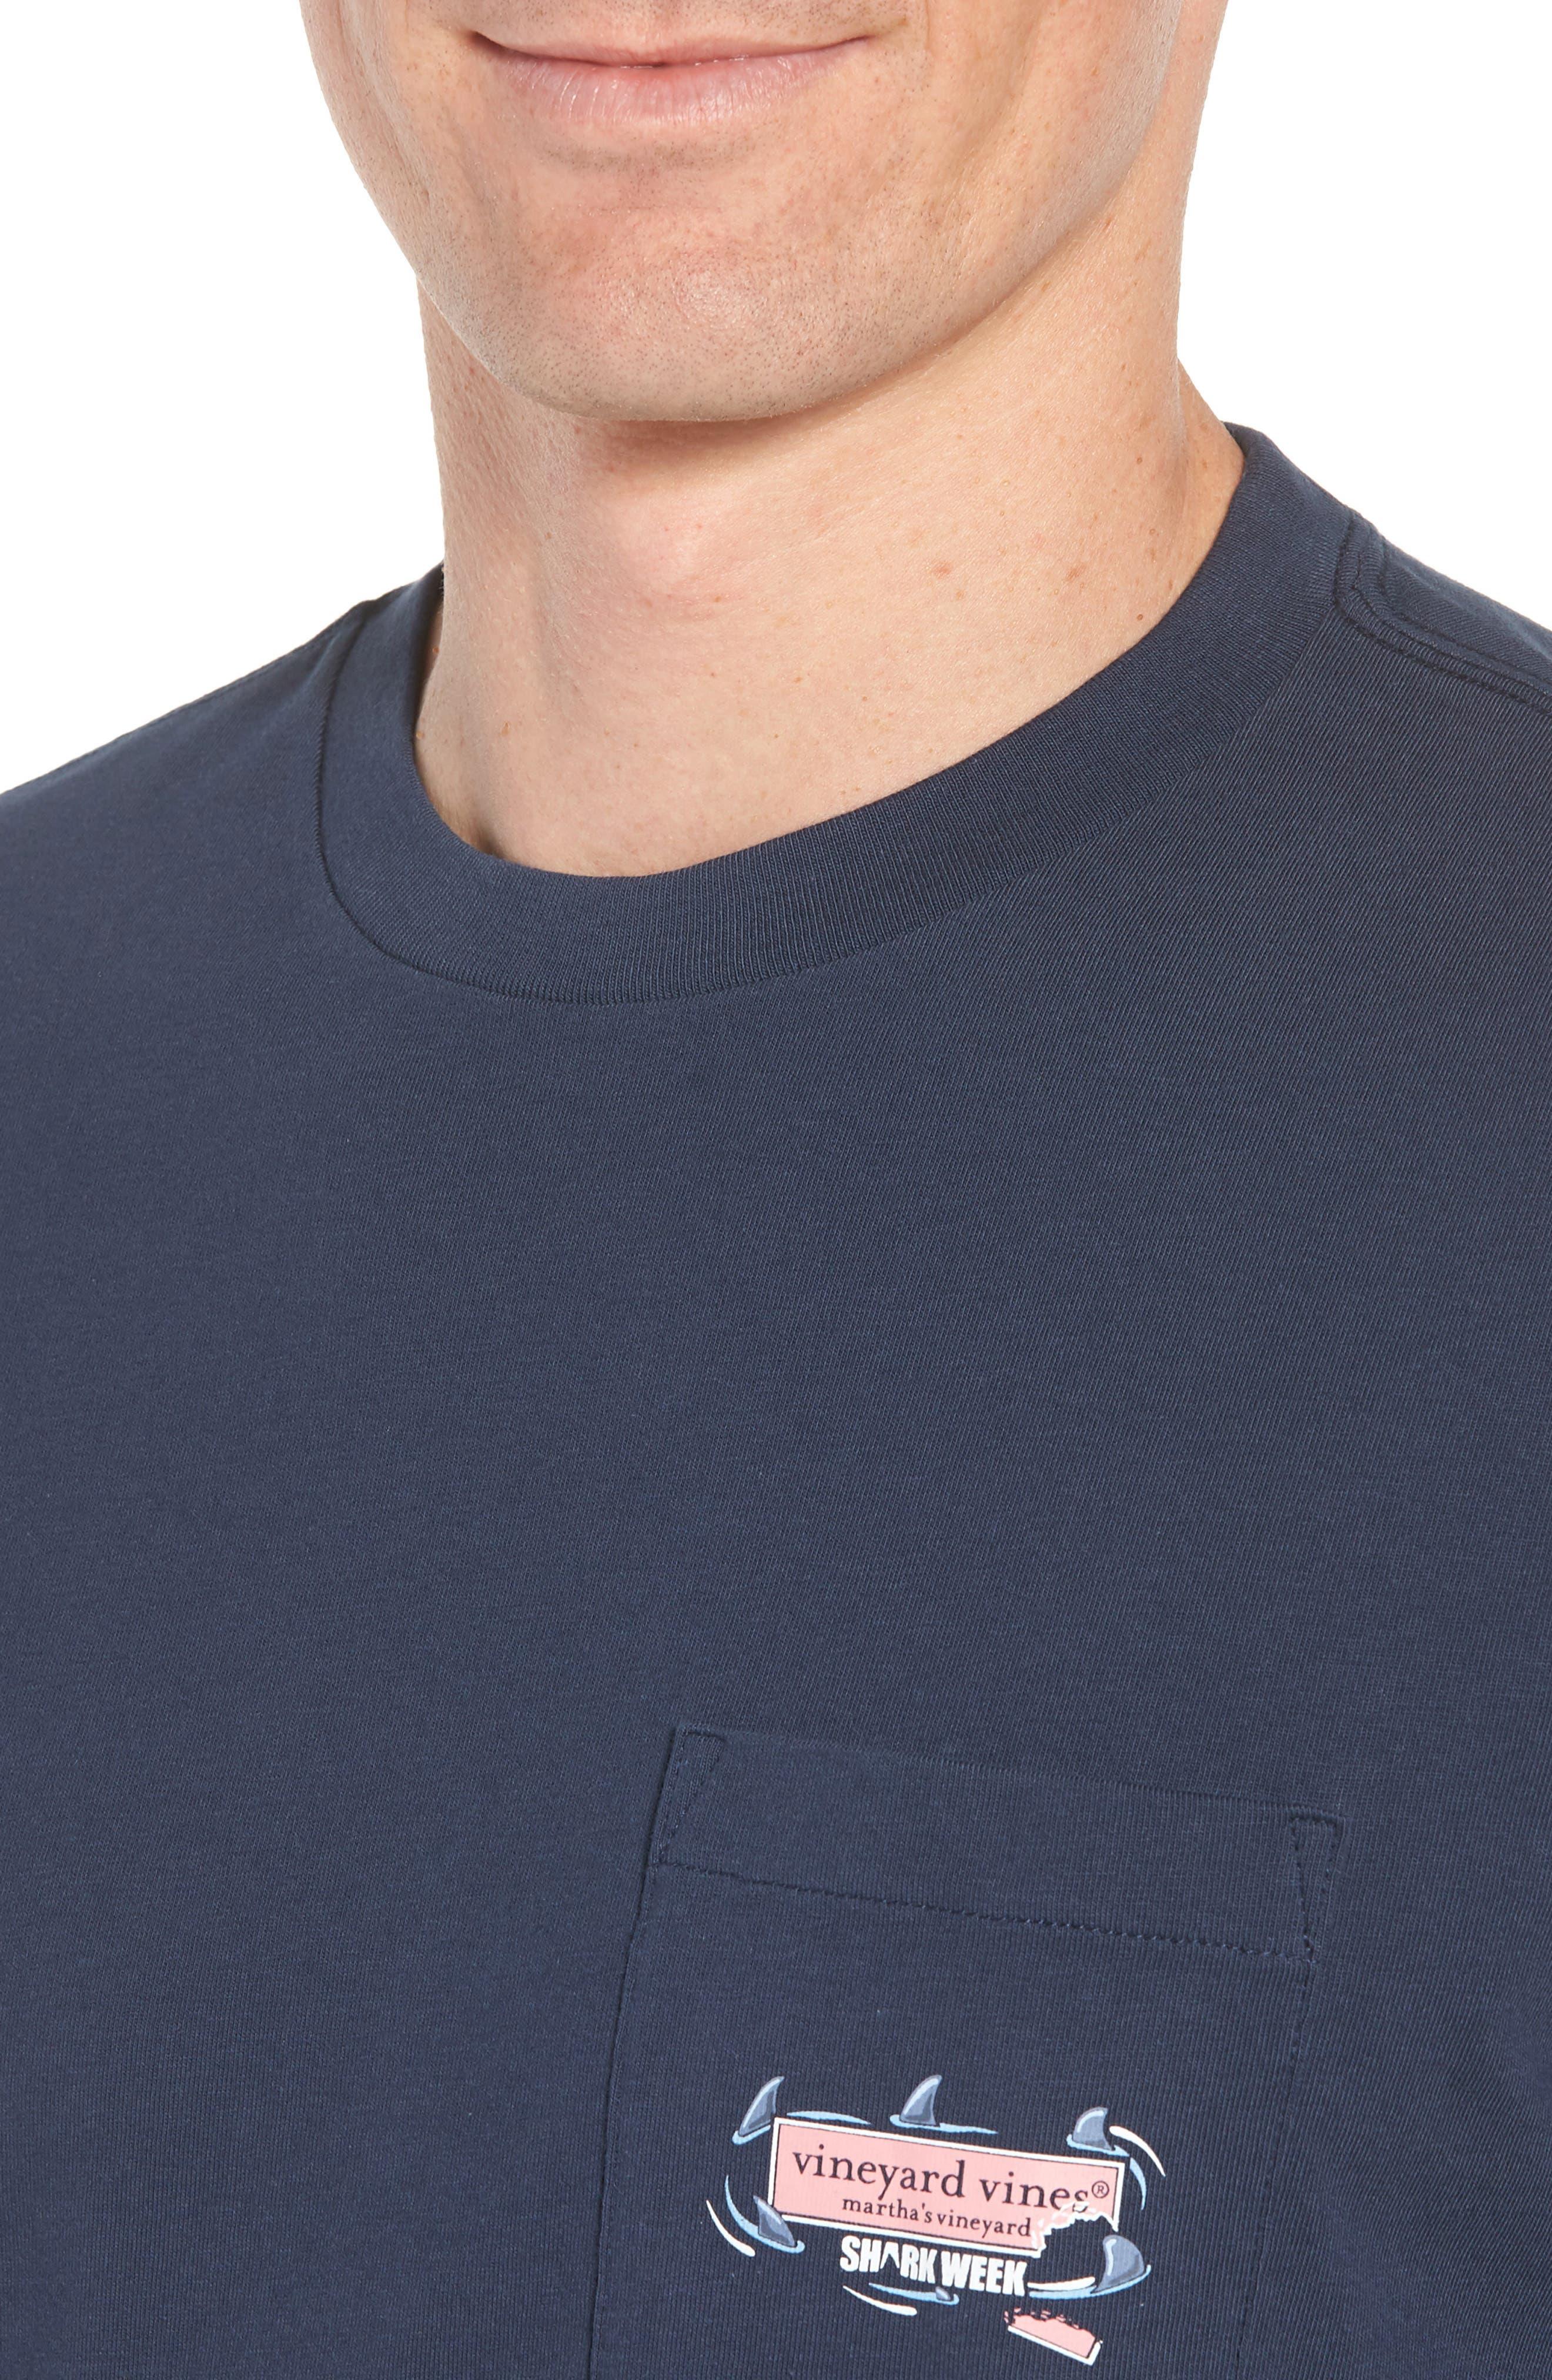 x Shark Week<sup>™</sup> Circling Sharks Pocket T-Shirt,                             Alternate thumbnail 4, color,                             Blue Blazer